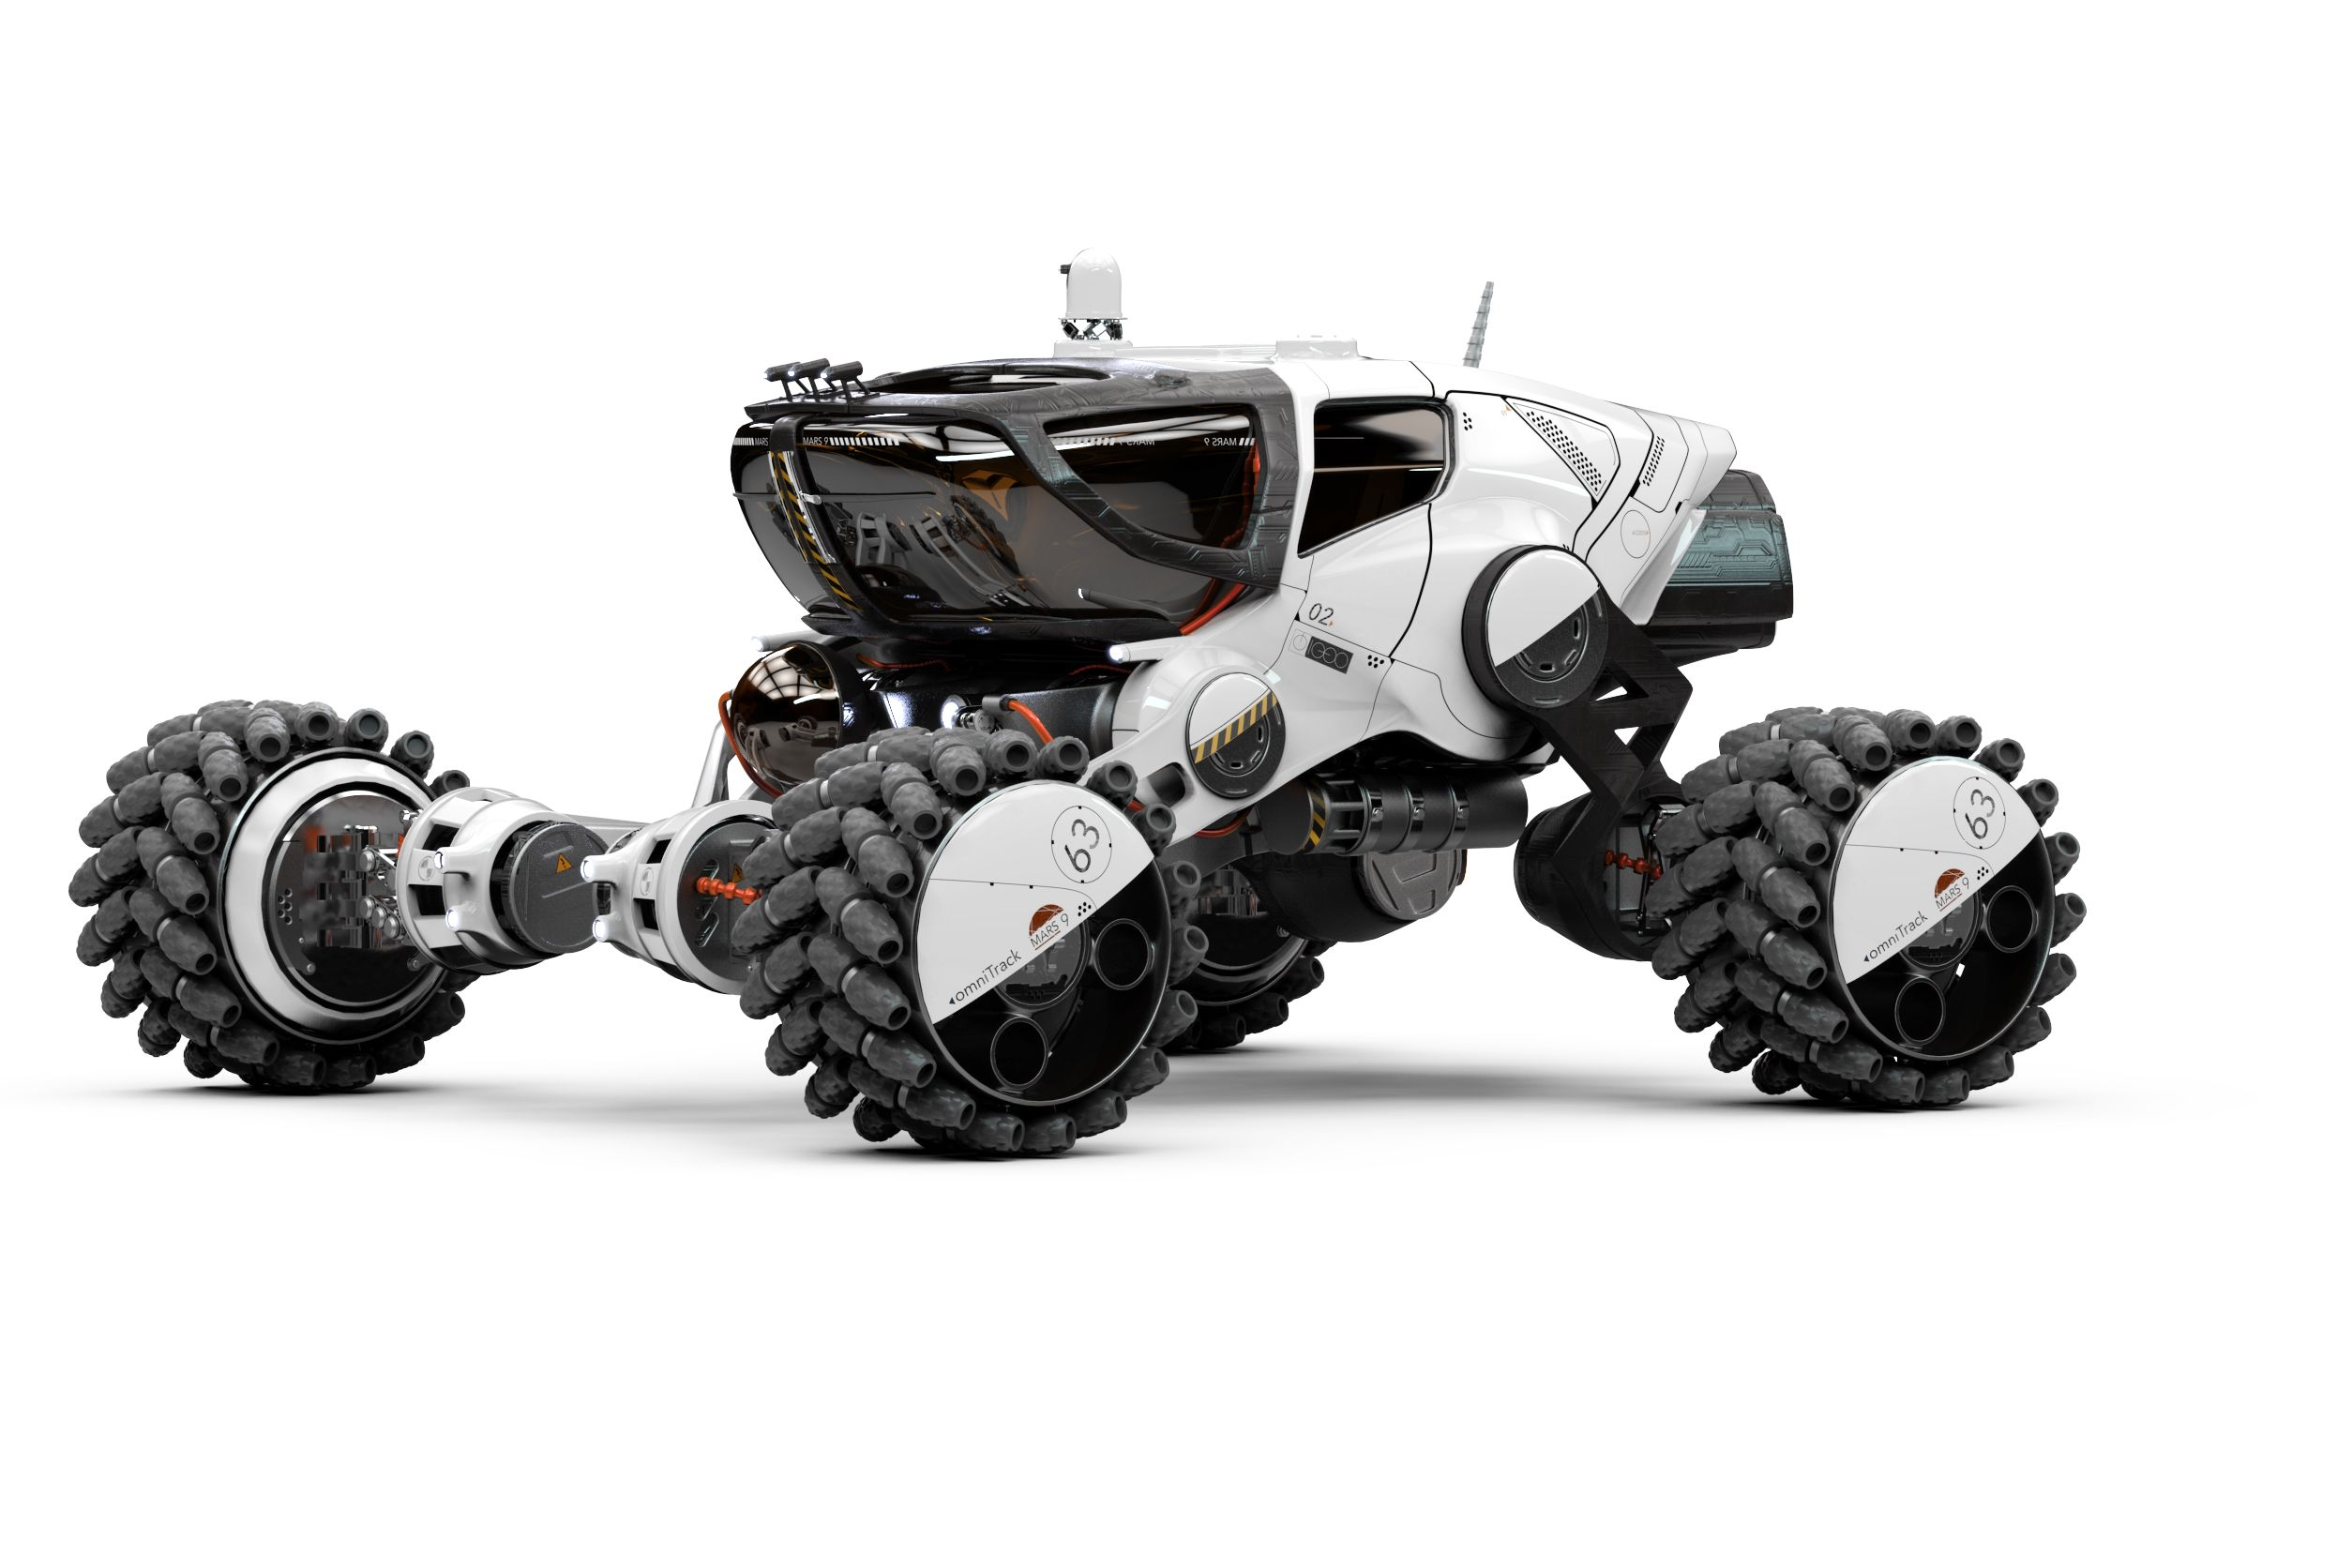 Mars 9 Rover 3/4 view | CONCEPT ART | Pinterest | Sci fi ...